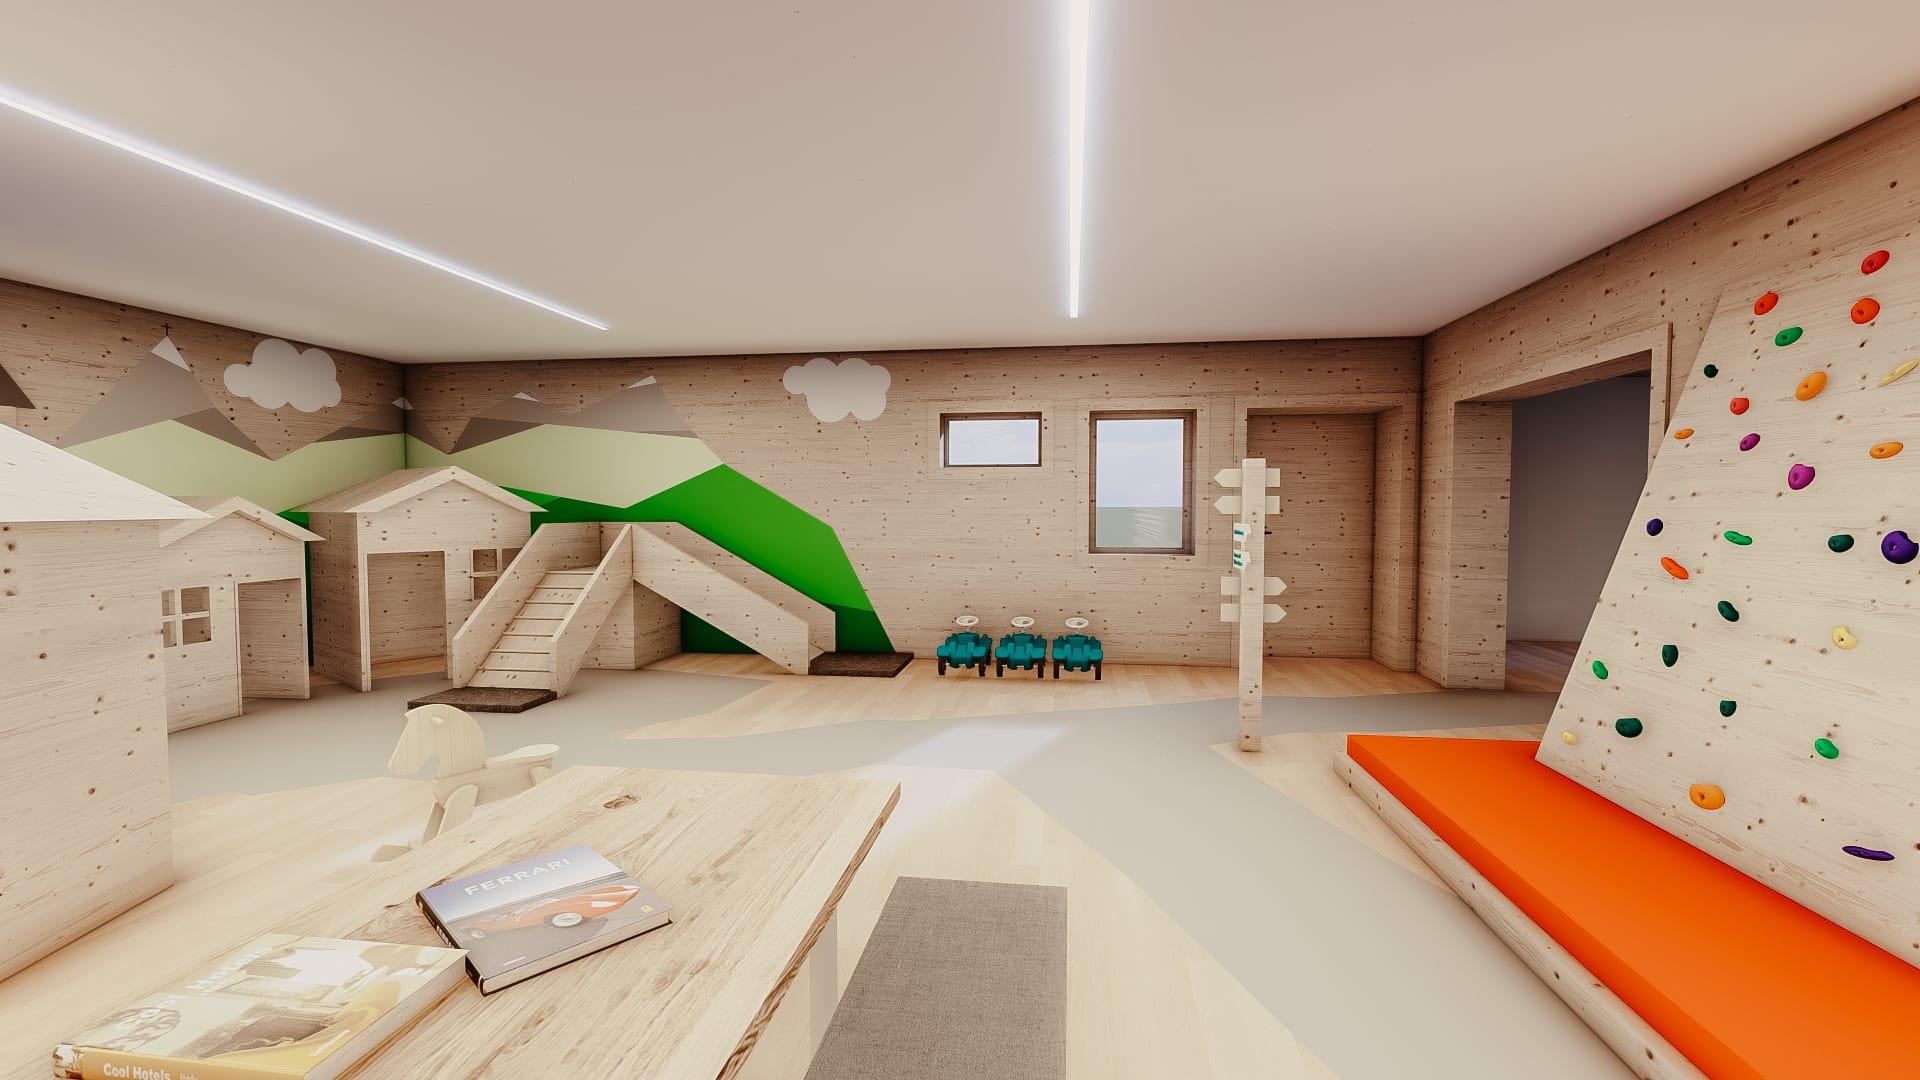 08-hofgut-apartment-lifestyle-resort-wagrain-salzburg-hofgut-kinderspielbereich.jpg